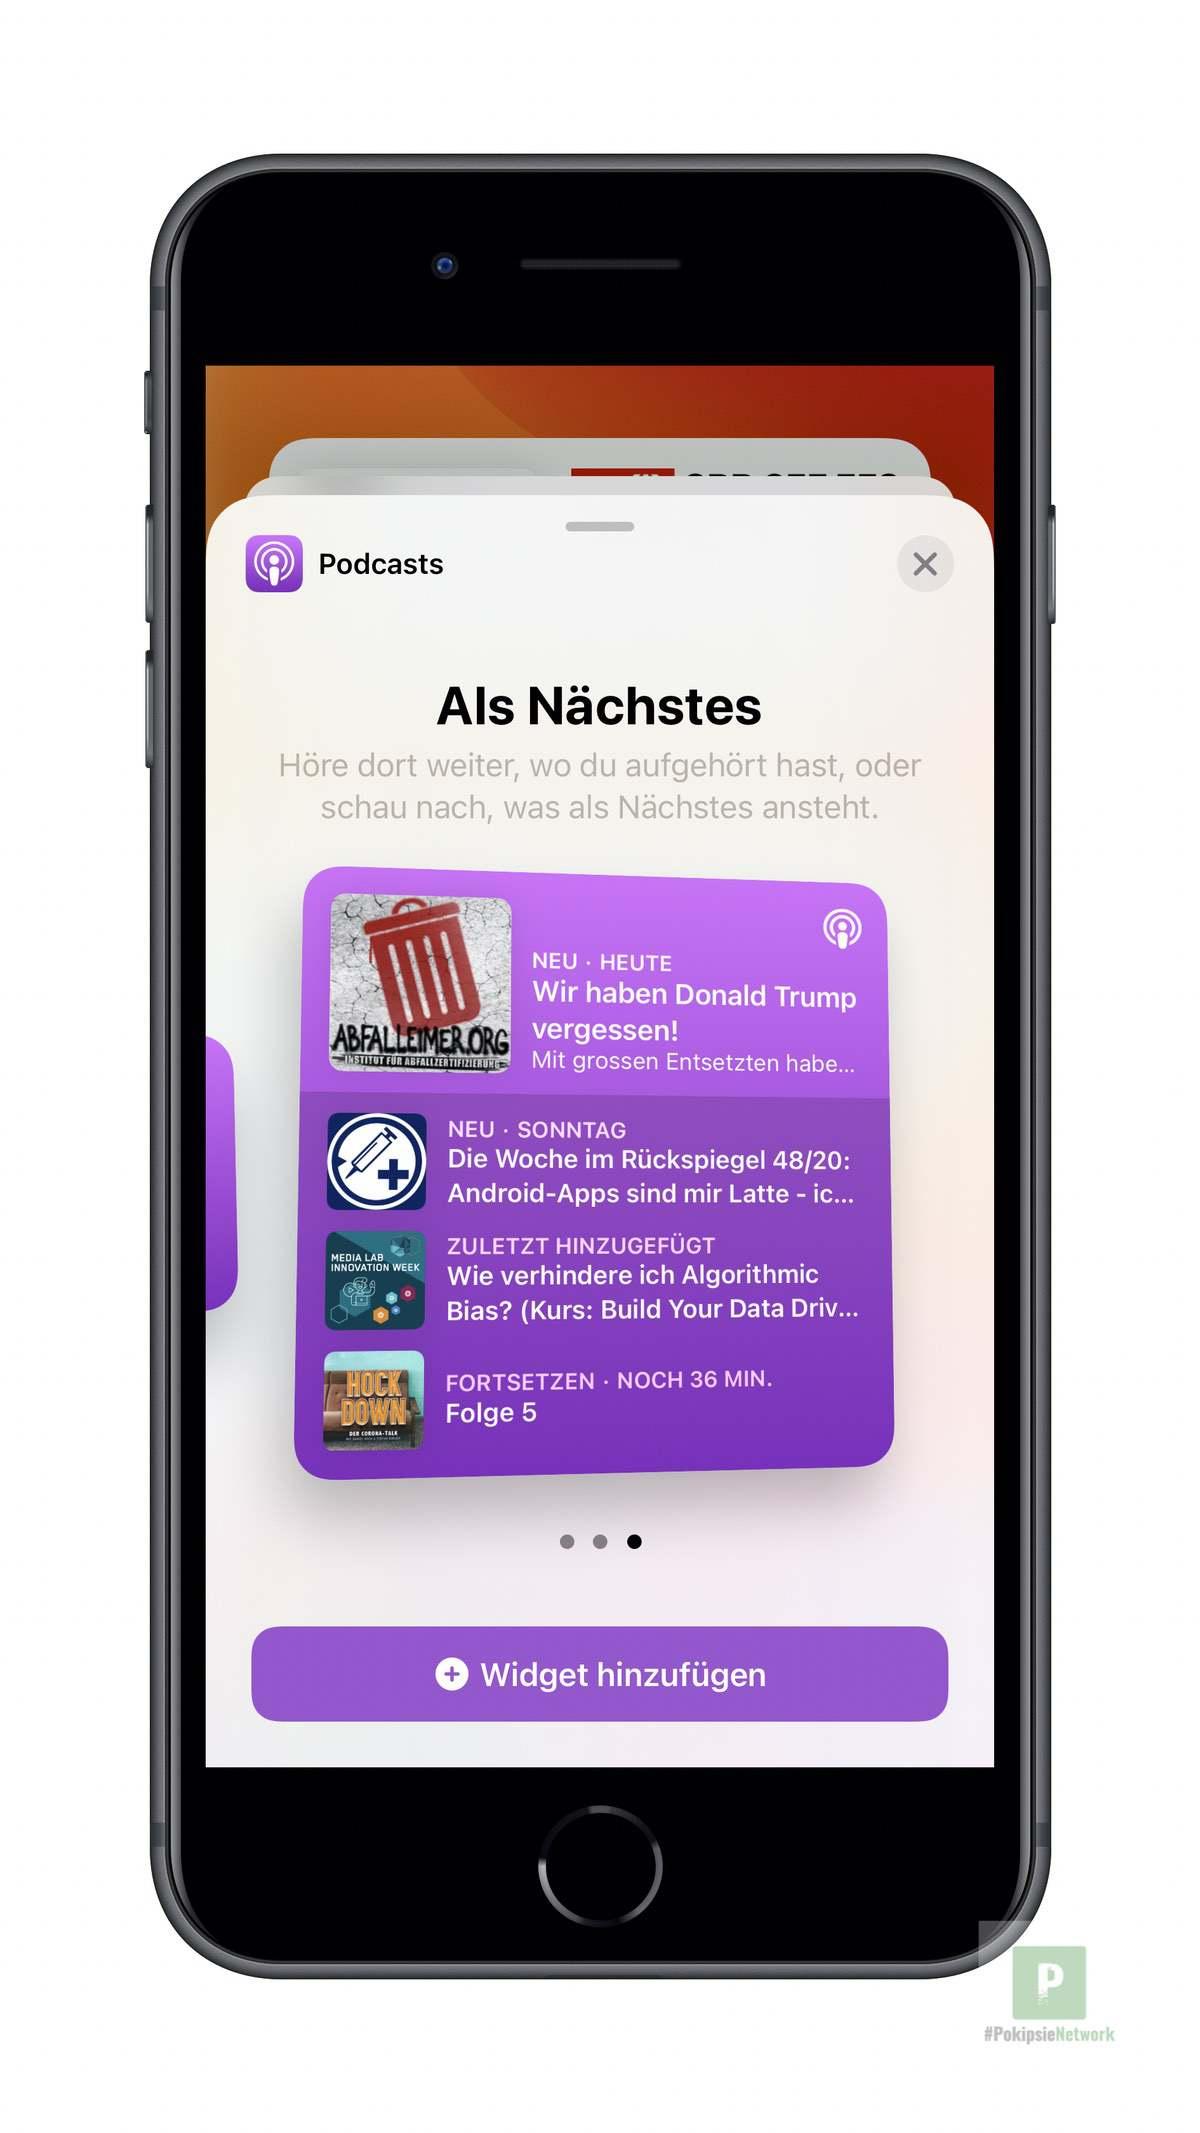 Apple Podcasts - Widgets aussuchen gross